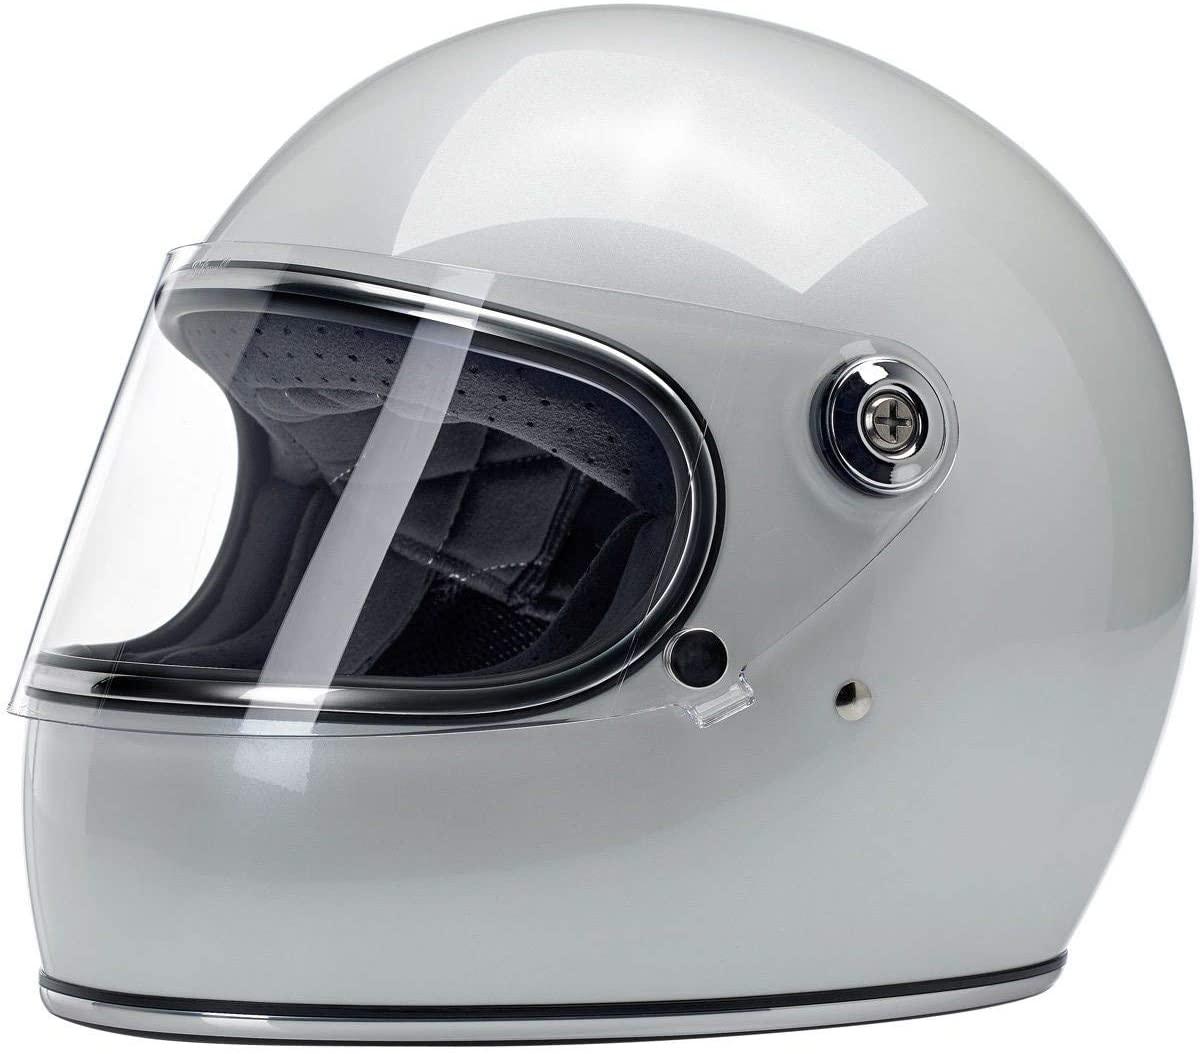 Biltwell Gringo S Helmet (Metallic Pearl White)